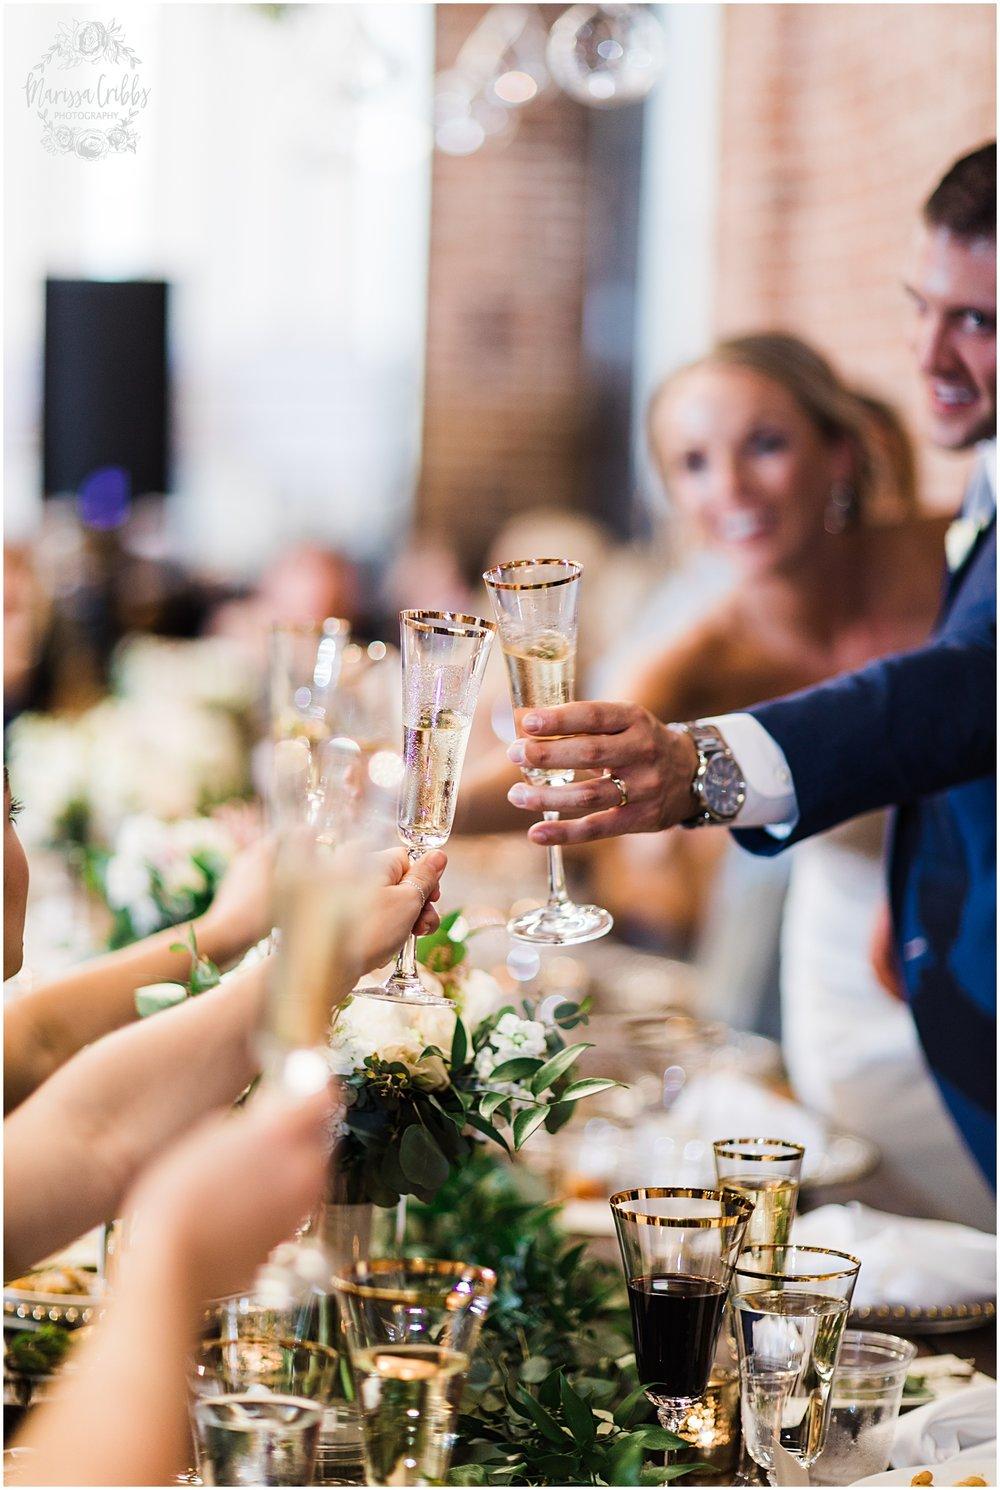 MAGNOLIA VENUE WEDDING | CHARLIE & NATALIE | MARISSA CRIBBS PHOTOGRAPHY_5797.jpg